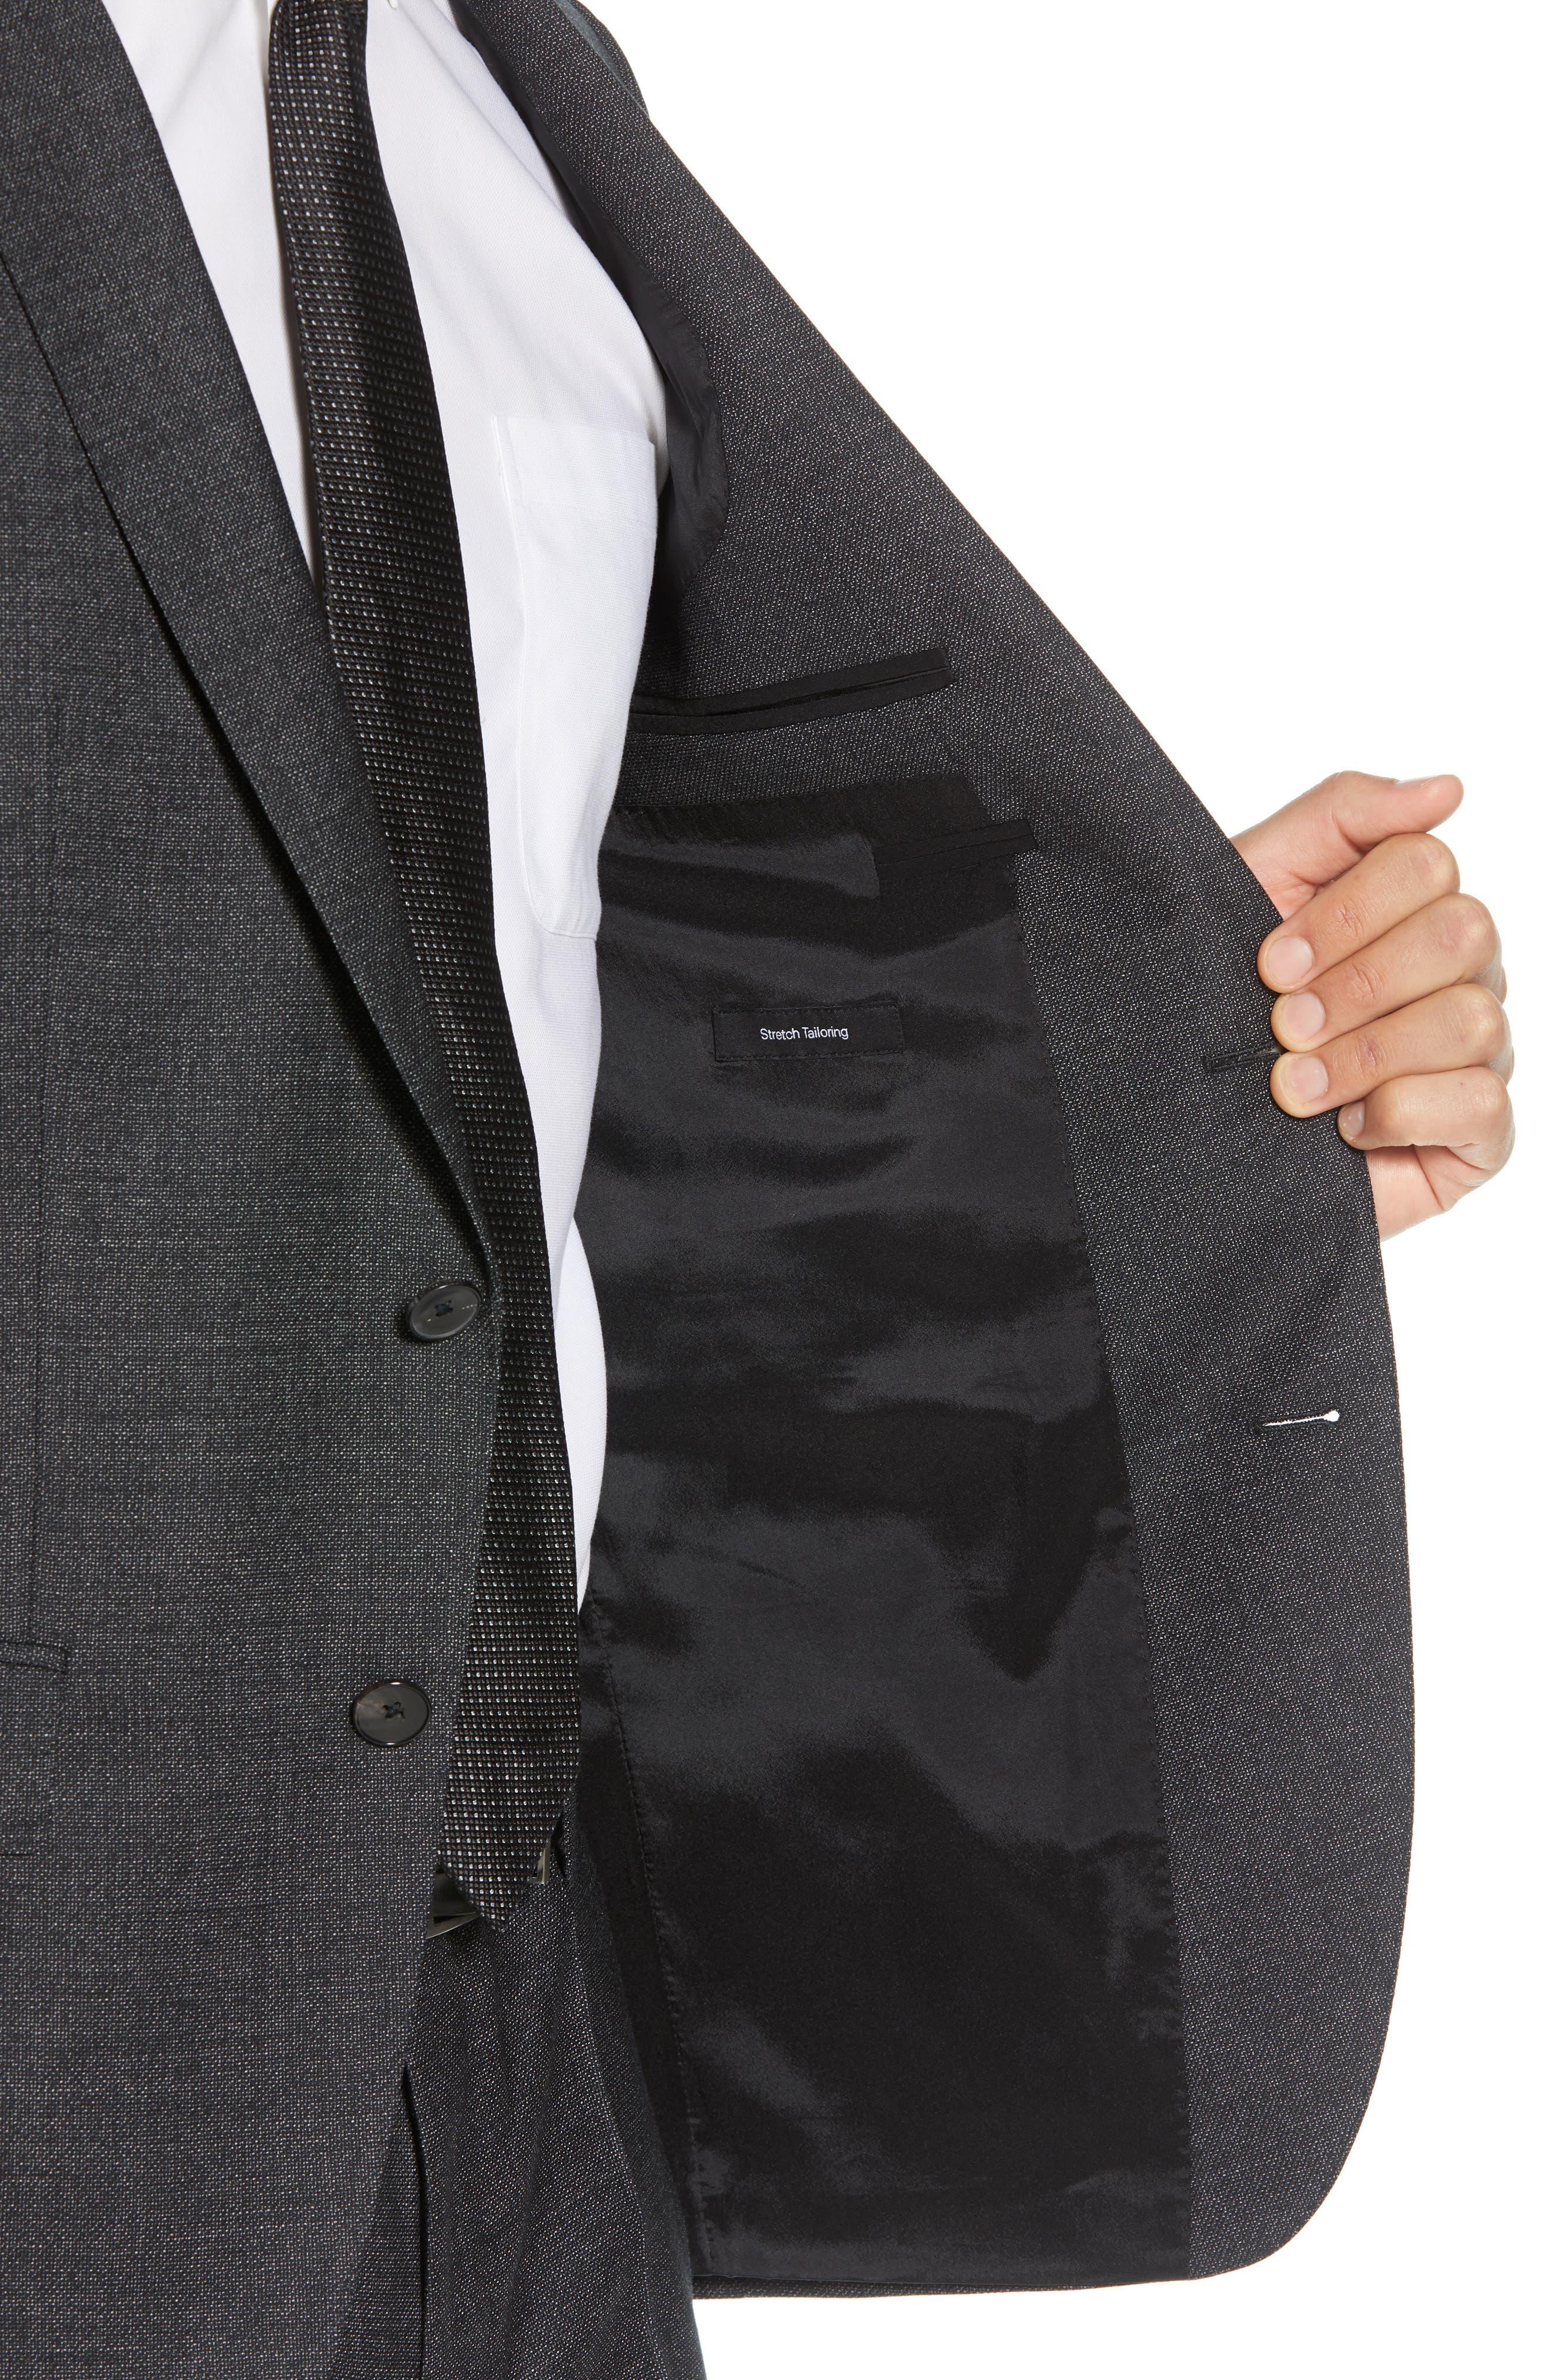 Huge/Genius Trim Fit Solid Wool Suit,                             Alternate thumbnail 4, color,                             BLACK